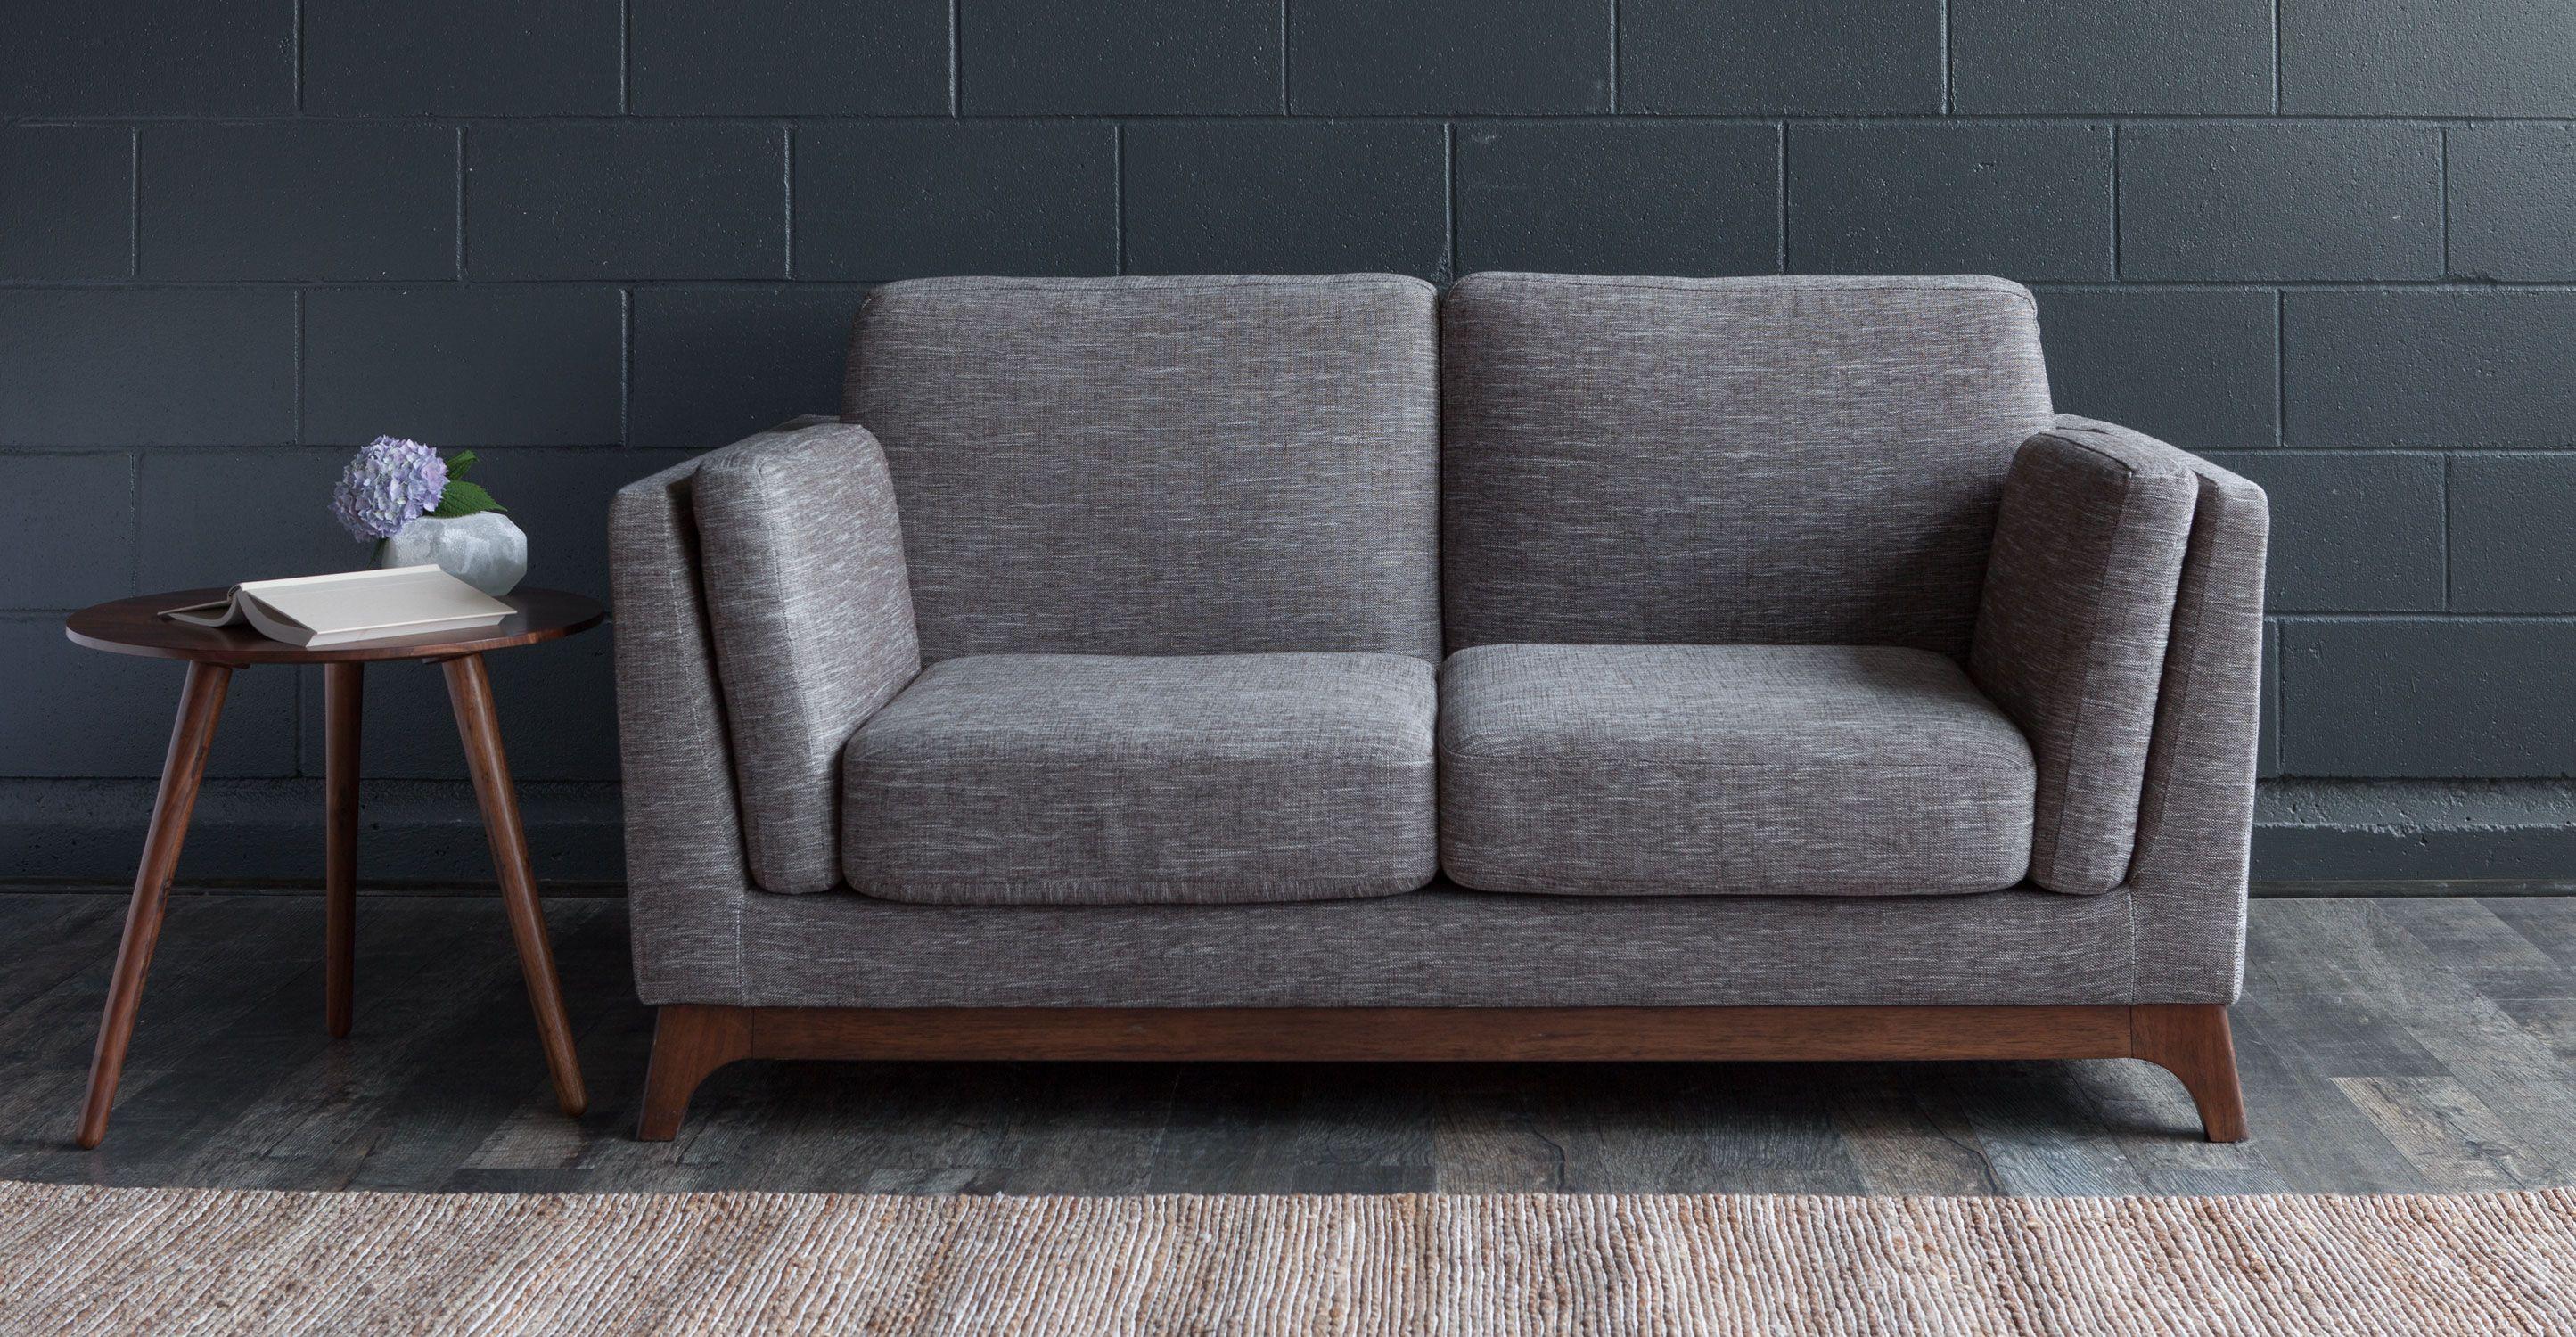 Ceni Volcanic Gray Loveseat Loveseats Article Modern Mid Century And Scandinavian Furniture 799